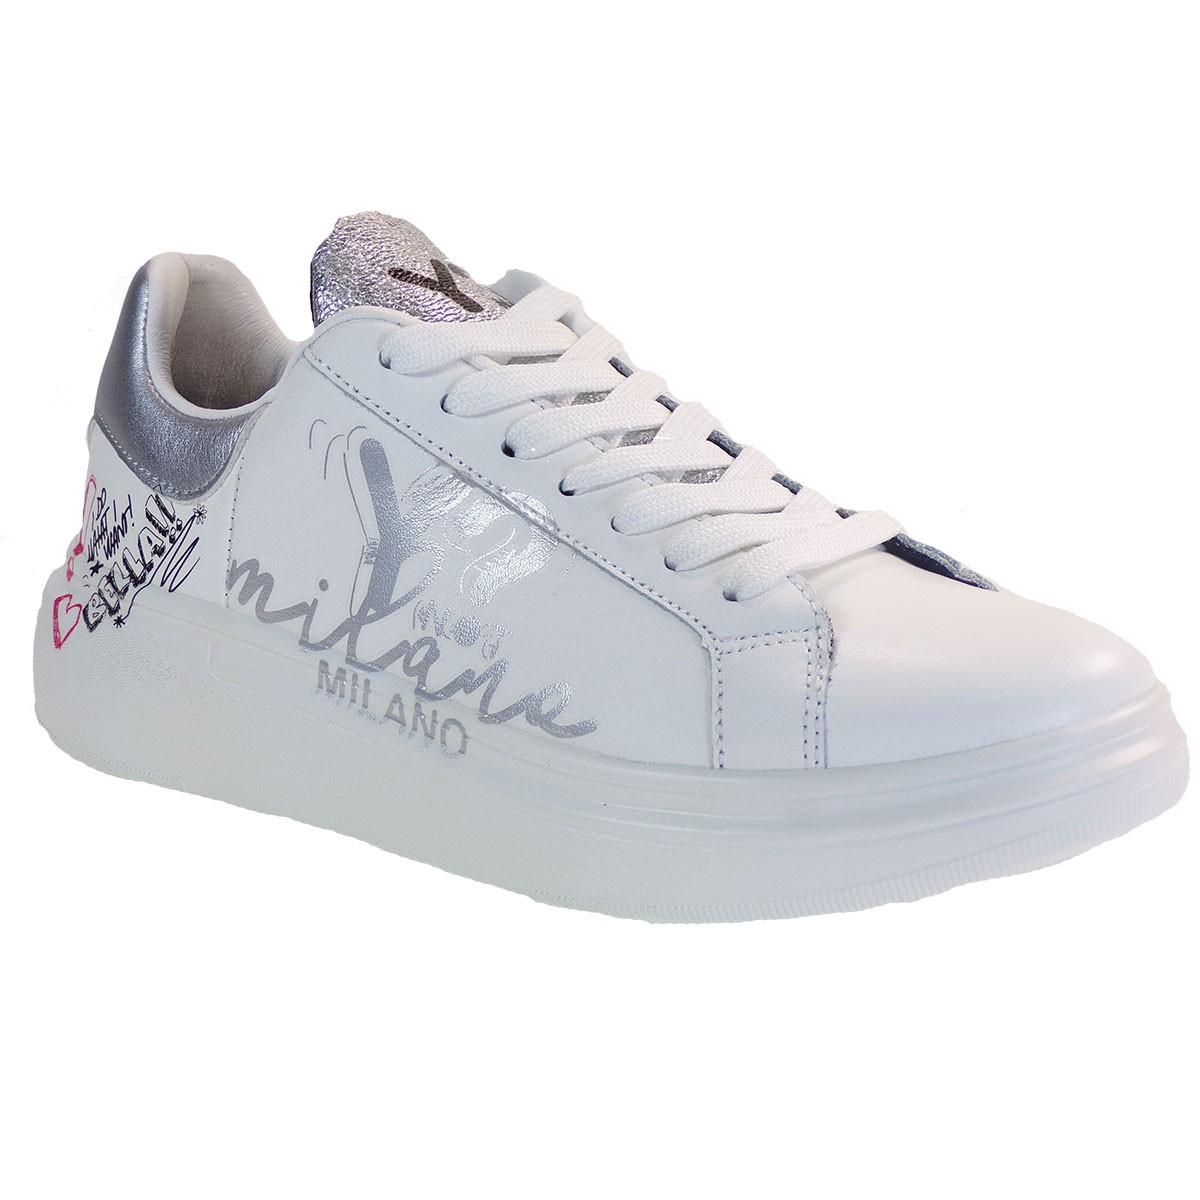 YNOT Sneakers Γυναικεία Παπούτσια YNIO400 Λευκό-Ασημί